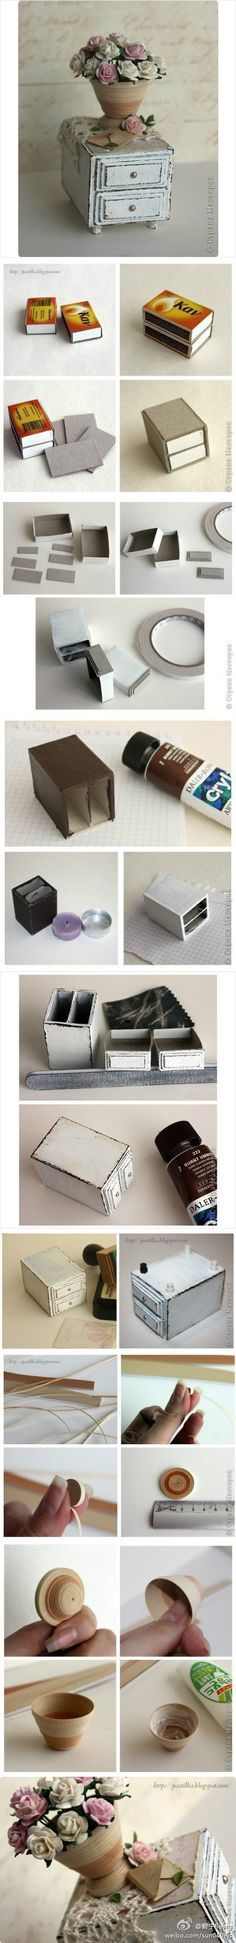 Miniature drawers tutorial.